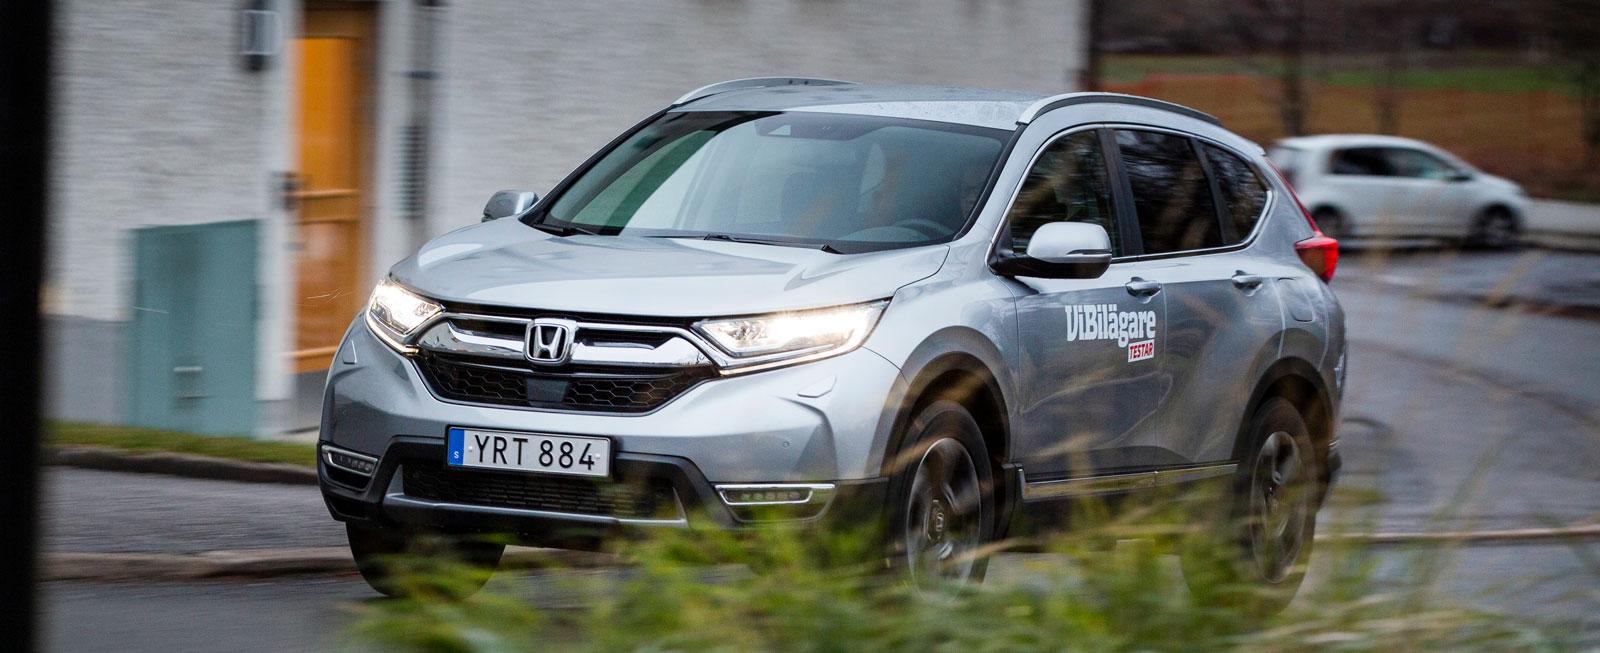 Honda CR-V 1,5 T AWD Lifestyle testvinnare.